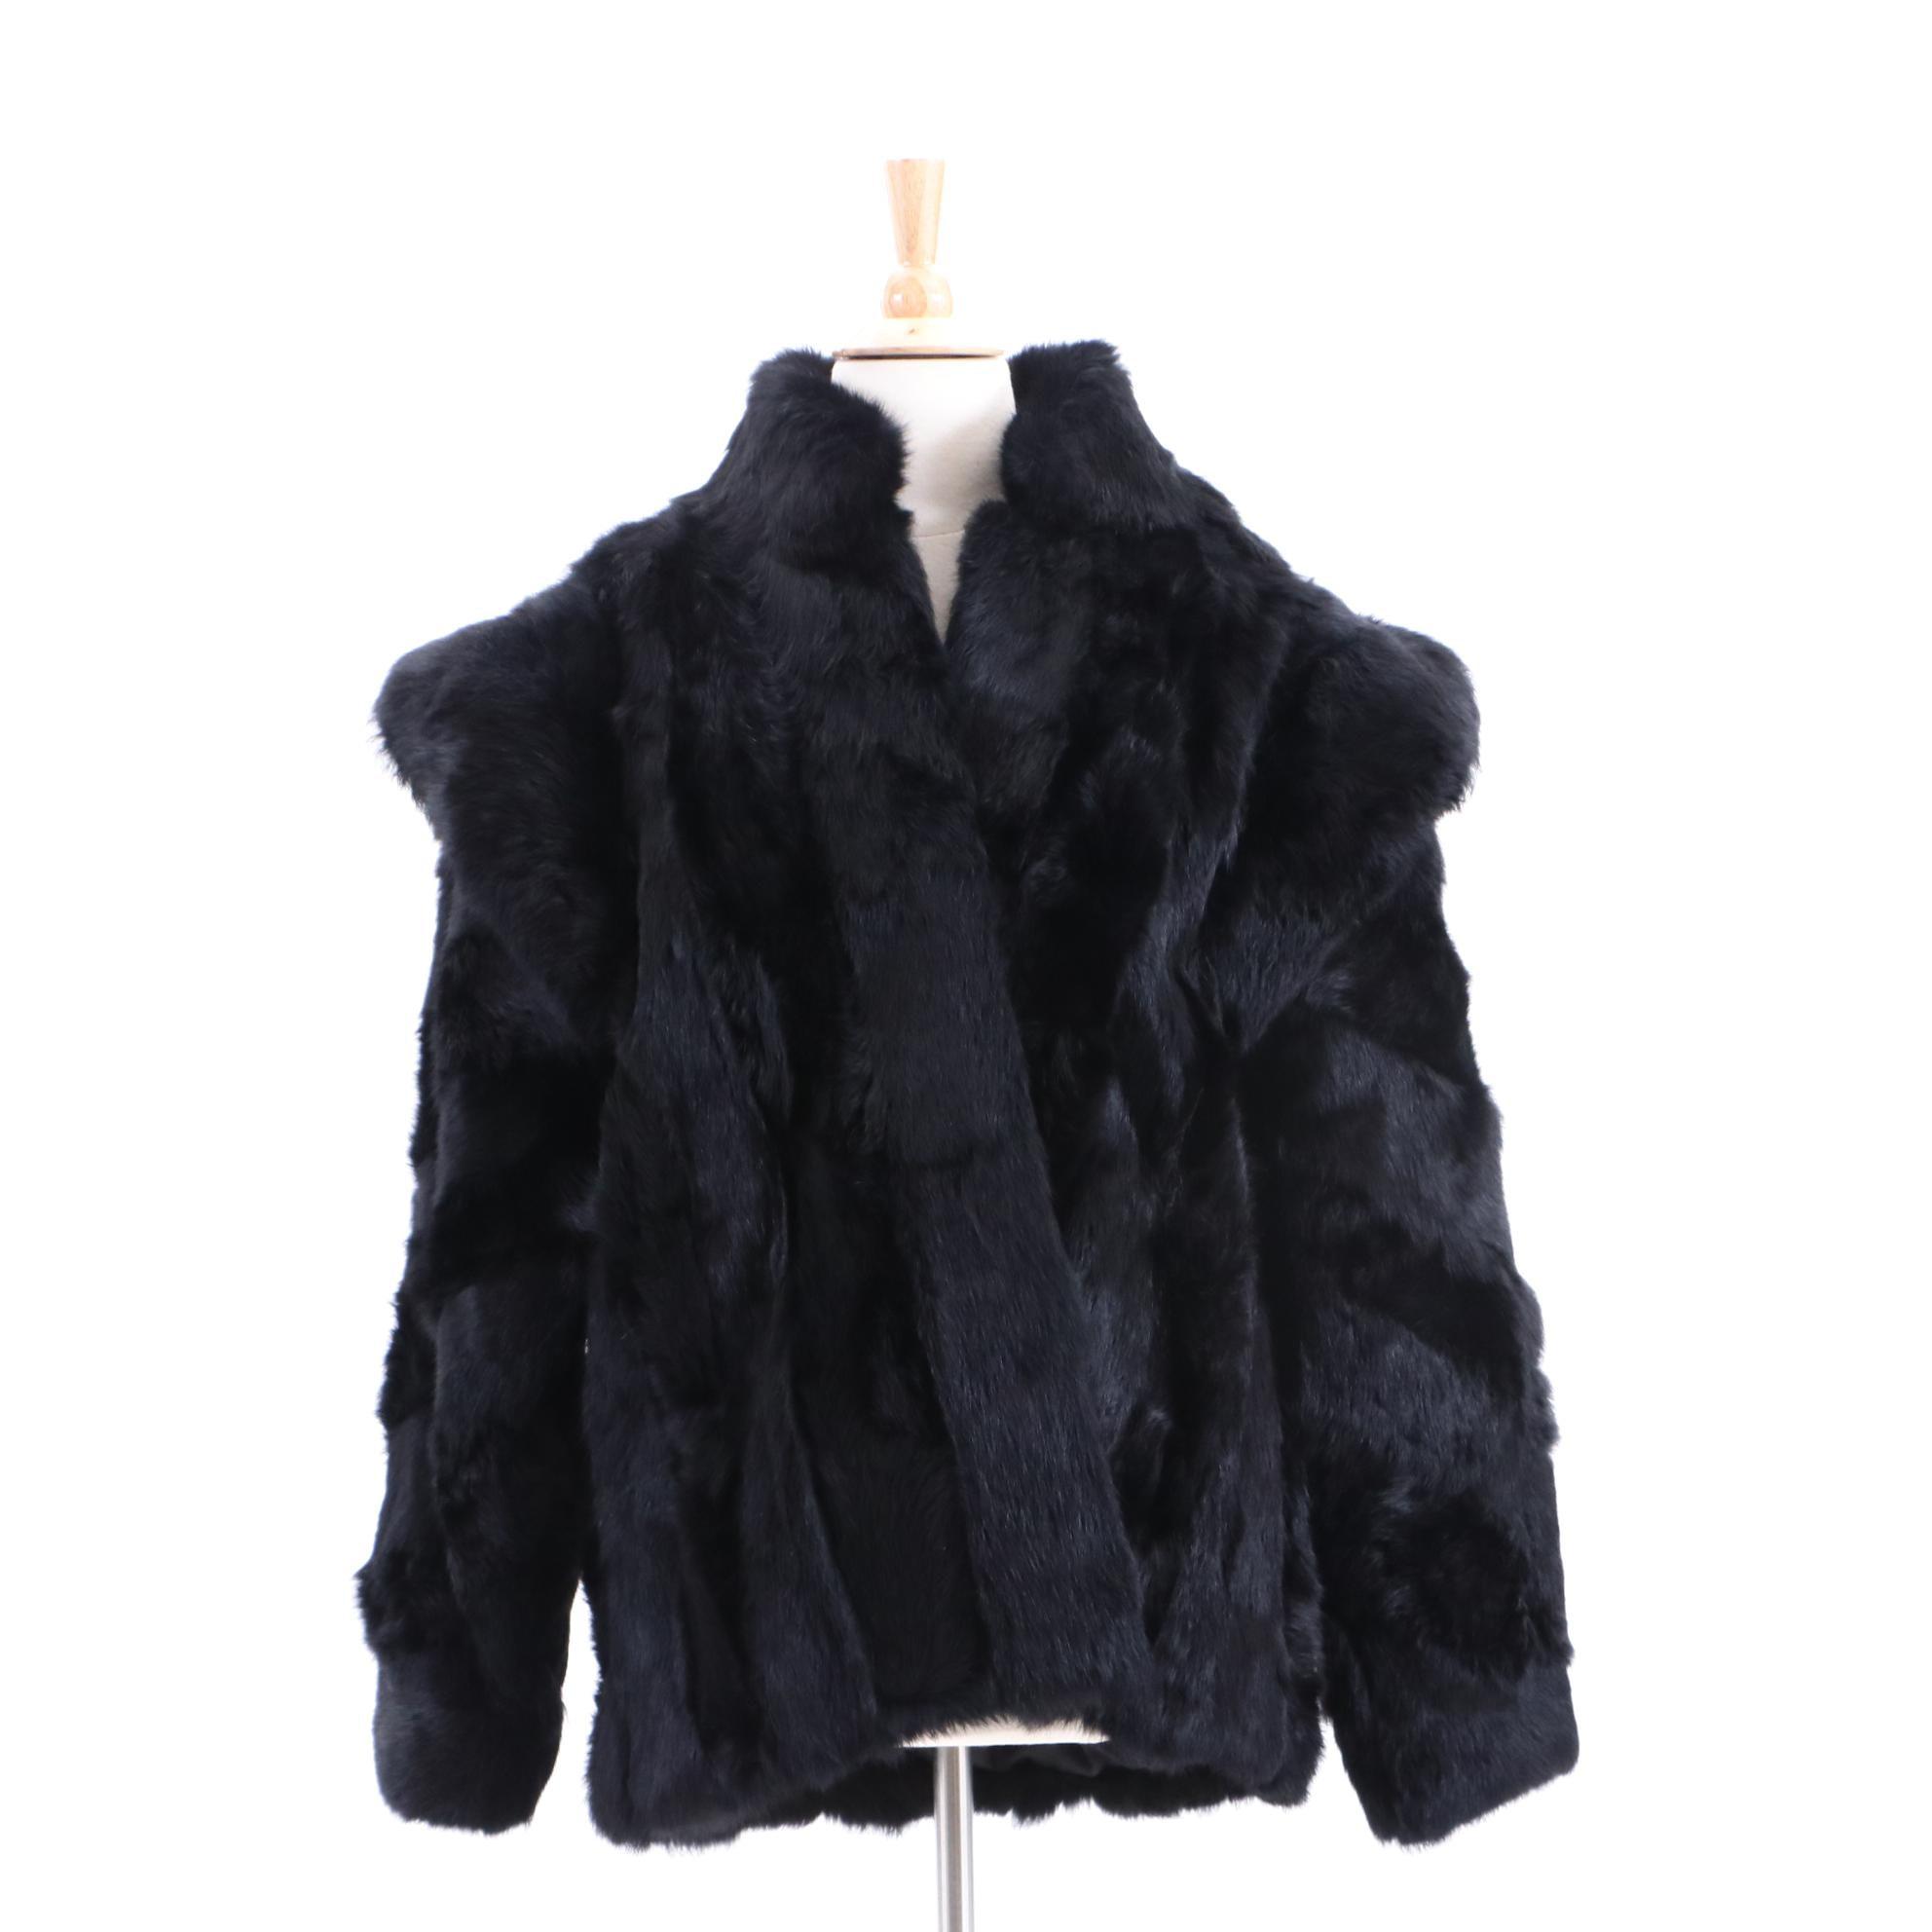 Vintage Bermans Rabbit Fur Coat